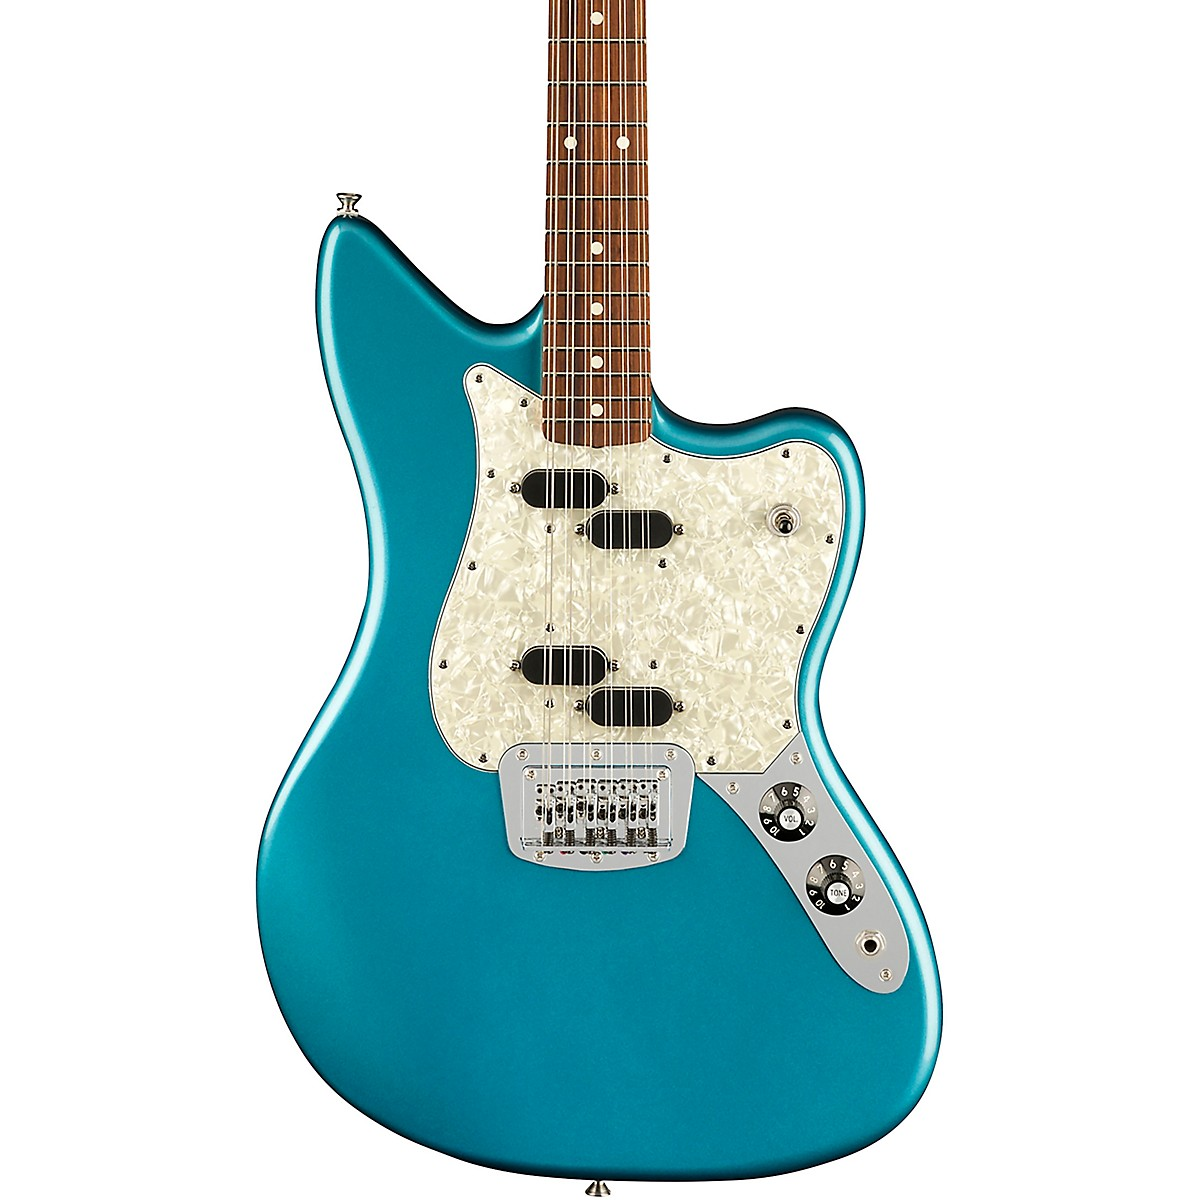 Fender Alternate Reality Electric XII Pau Ferro Fingerboard Electric Guitar